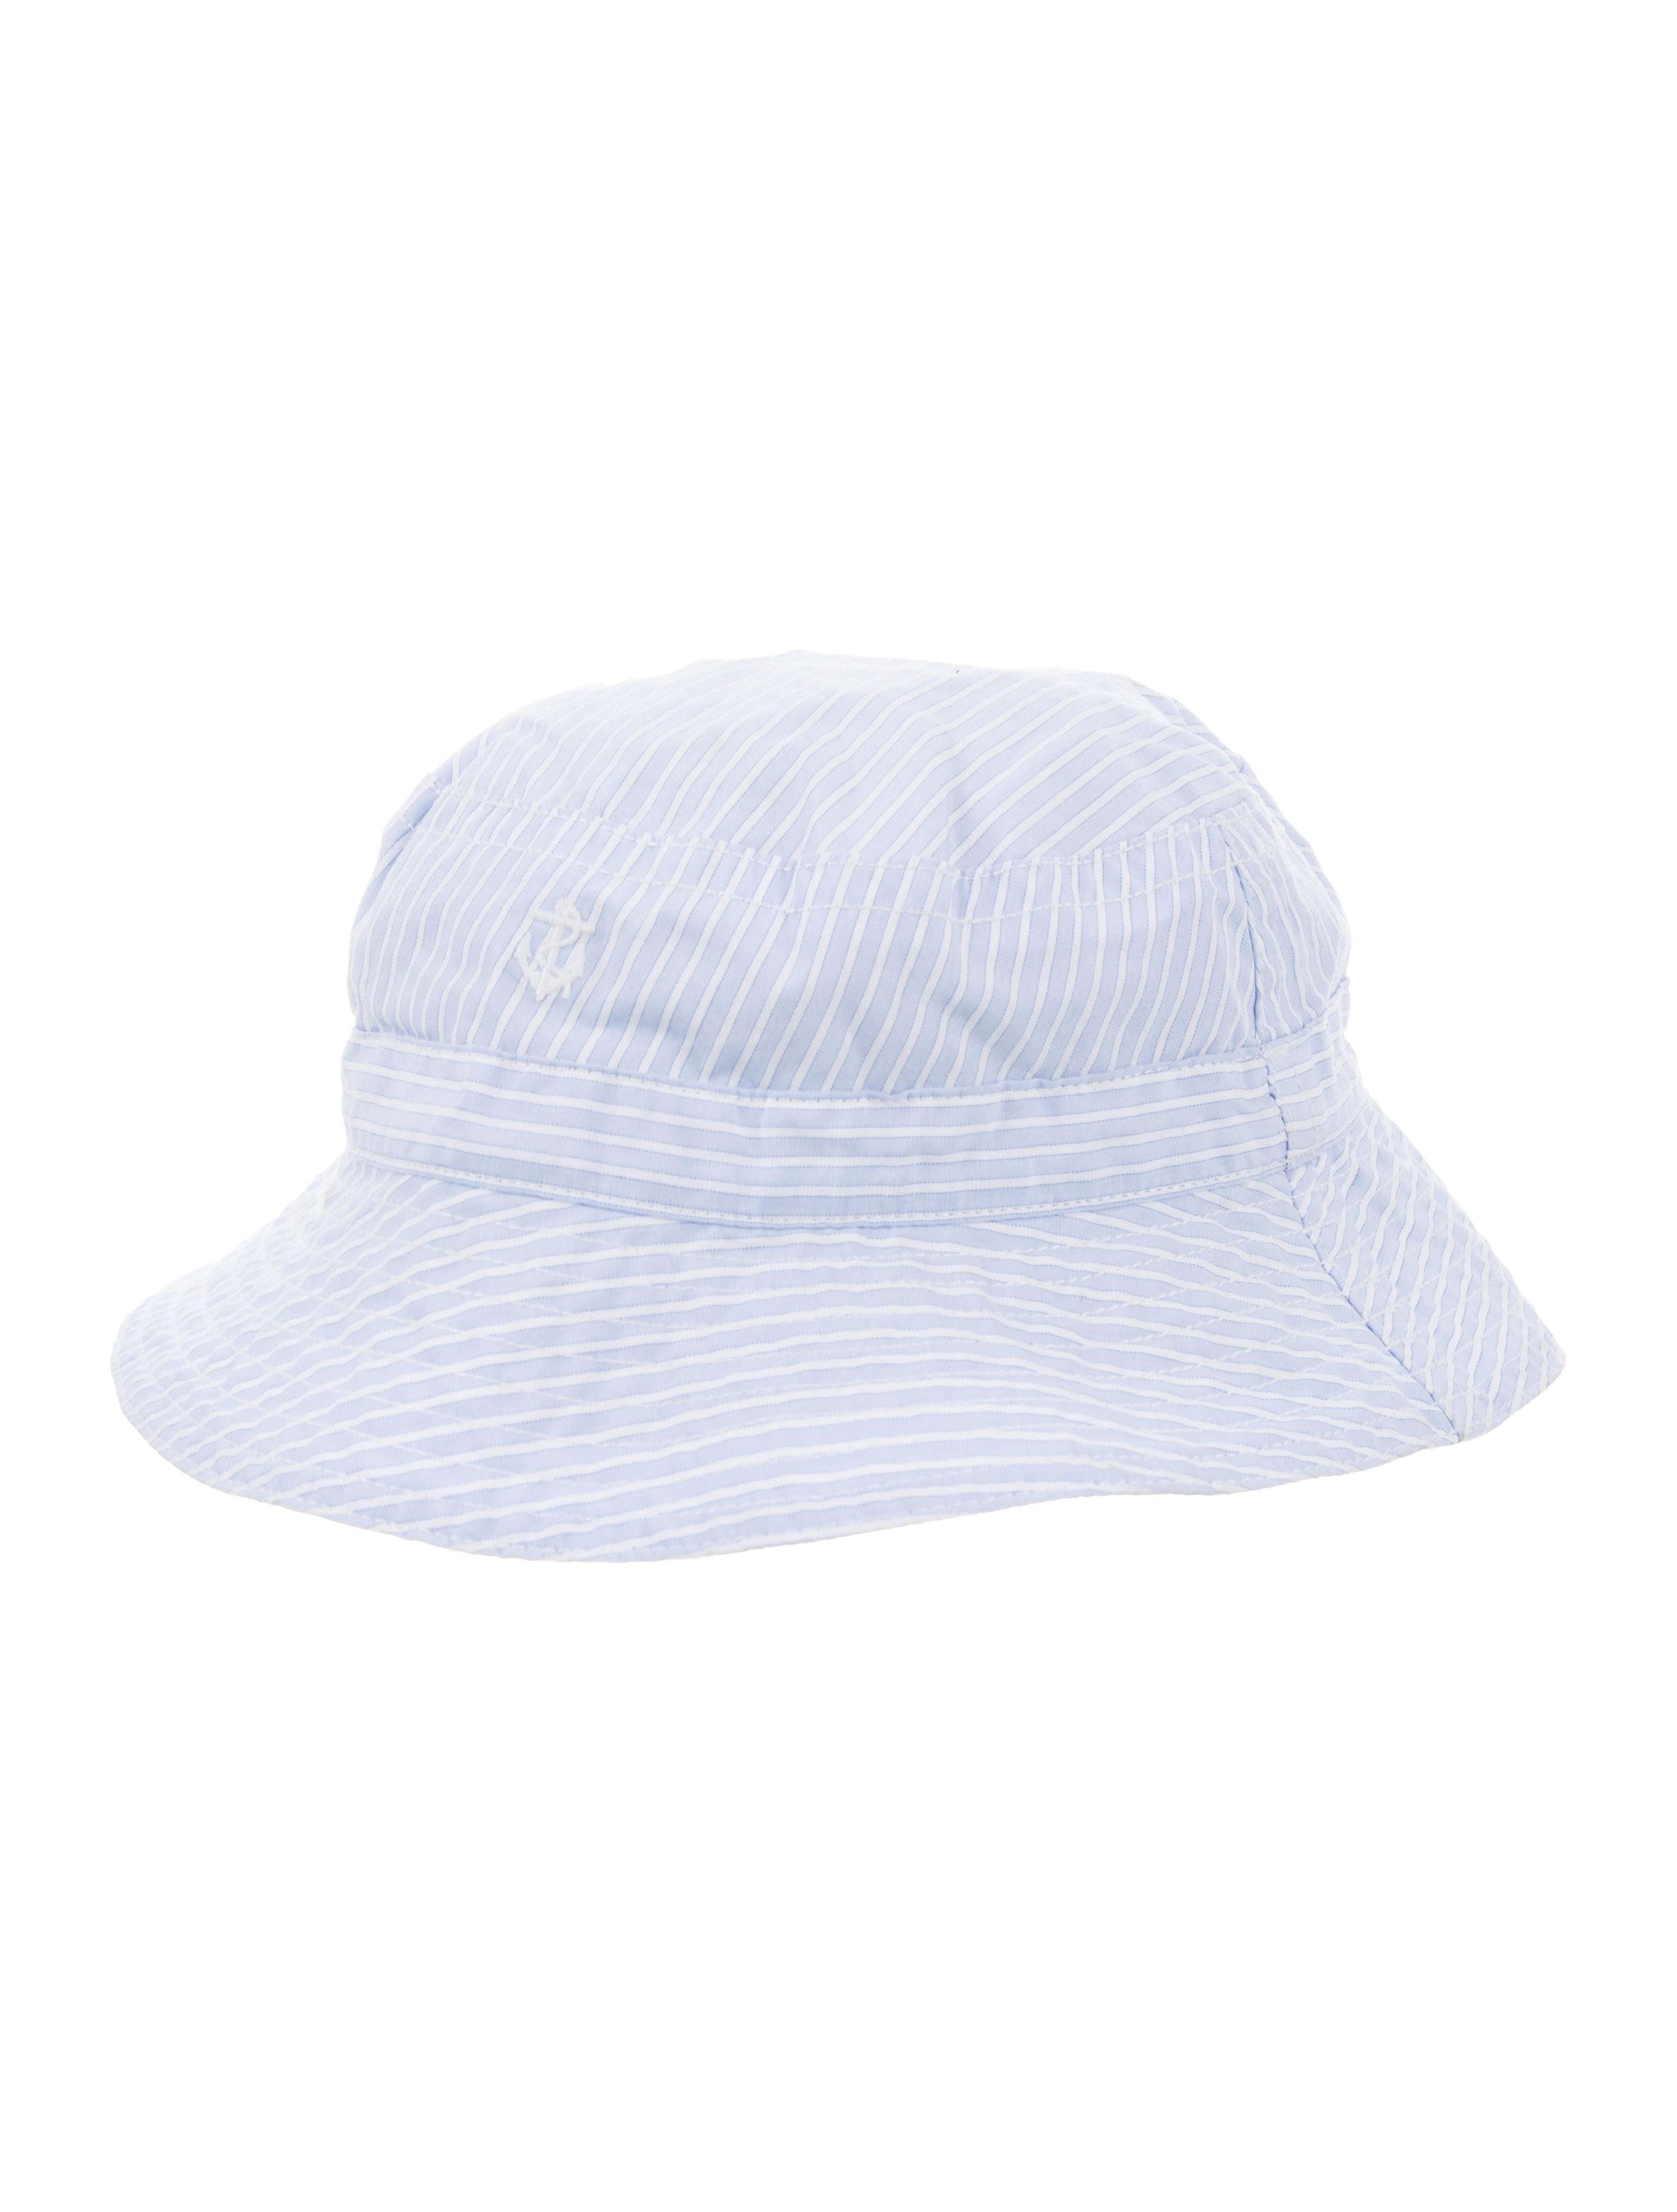 1eae613815088 Ralph Lauren Boys  Striped Bucket Hat - Boys - WYG34776